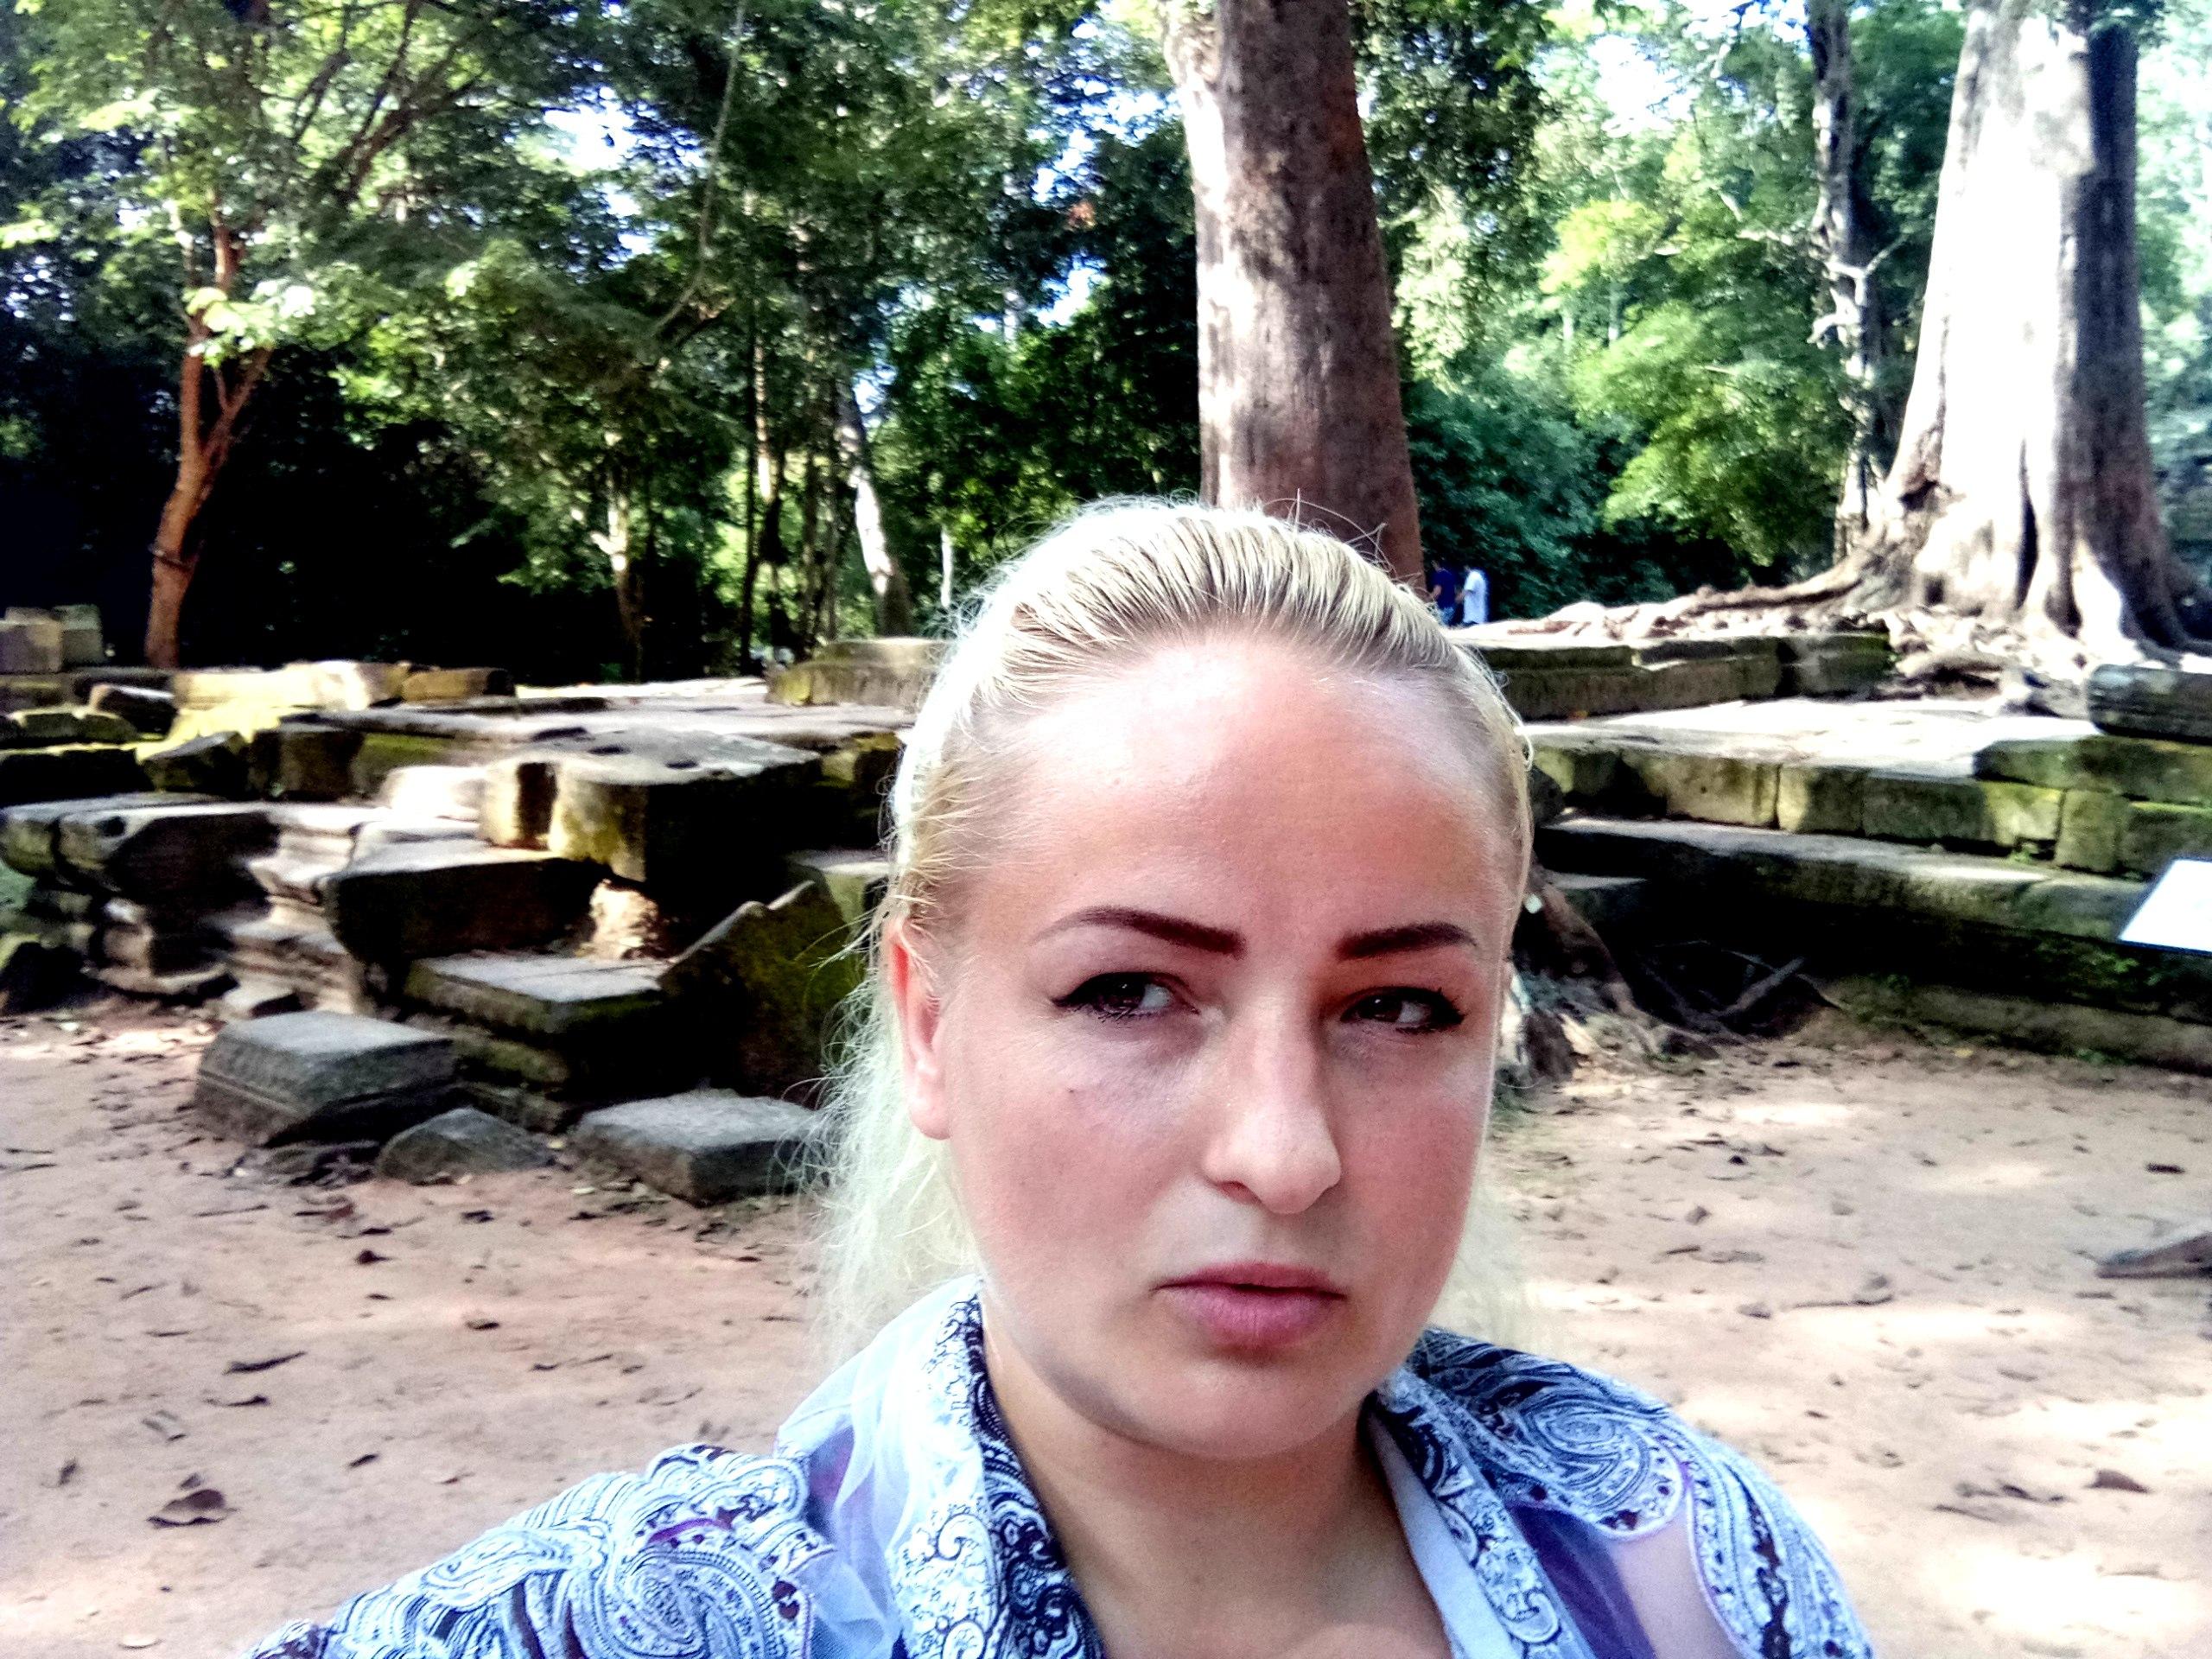 Елена Руденко (Валтея). Камбоджа. Ангкор. - Страница 3 Ob7hNuiYwn0